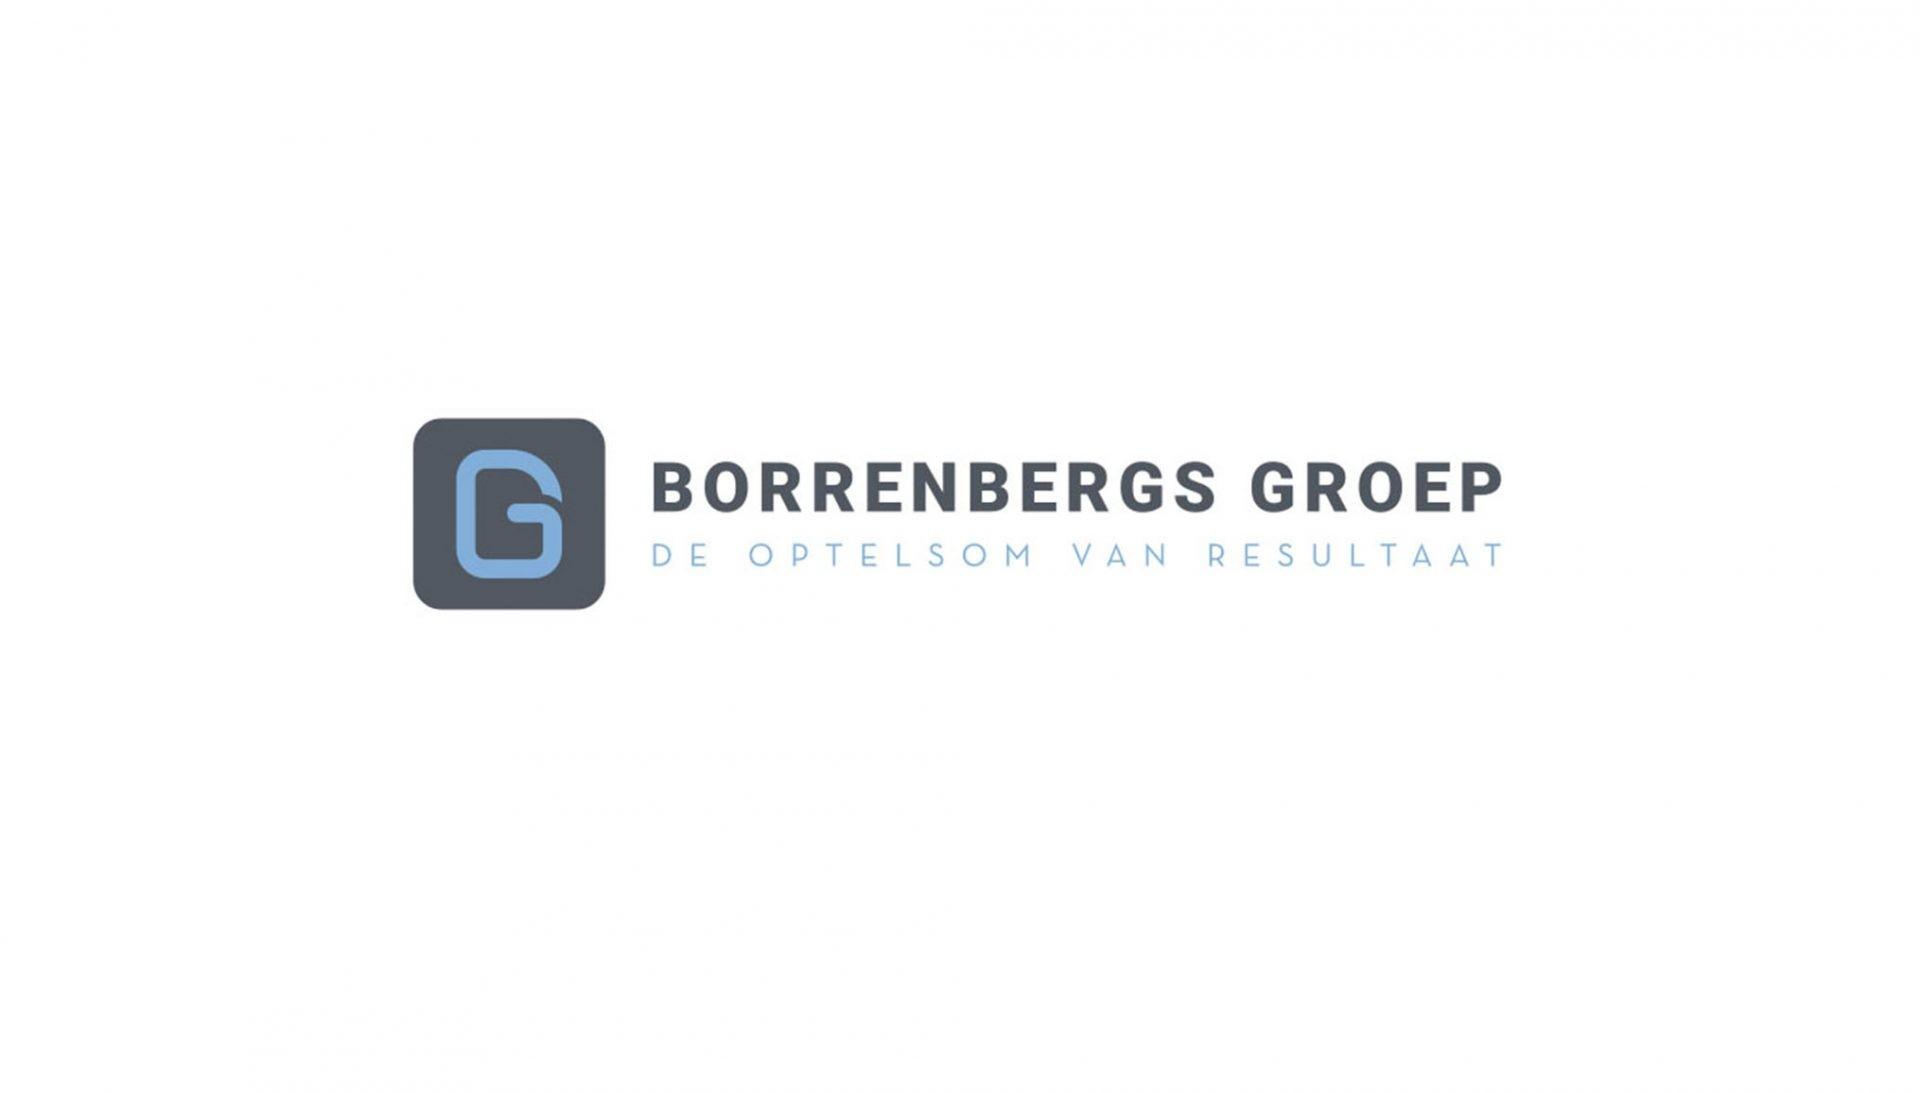 Borrenbergs Groep